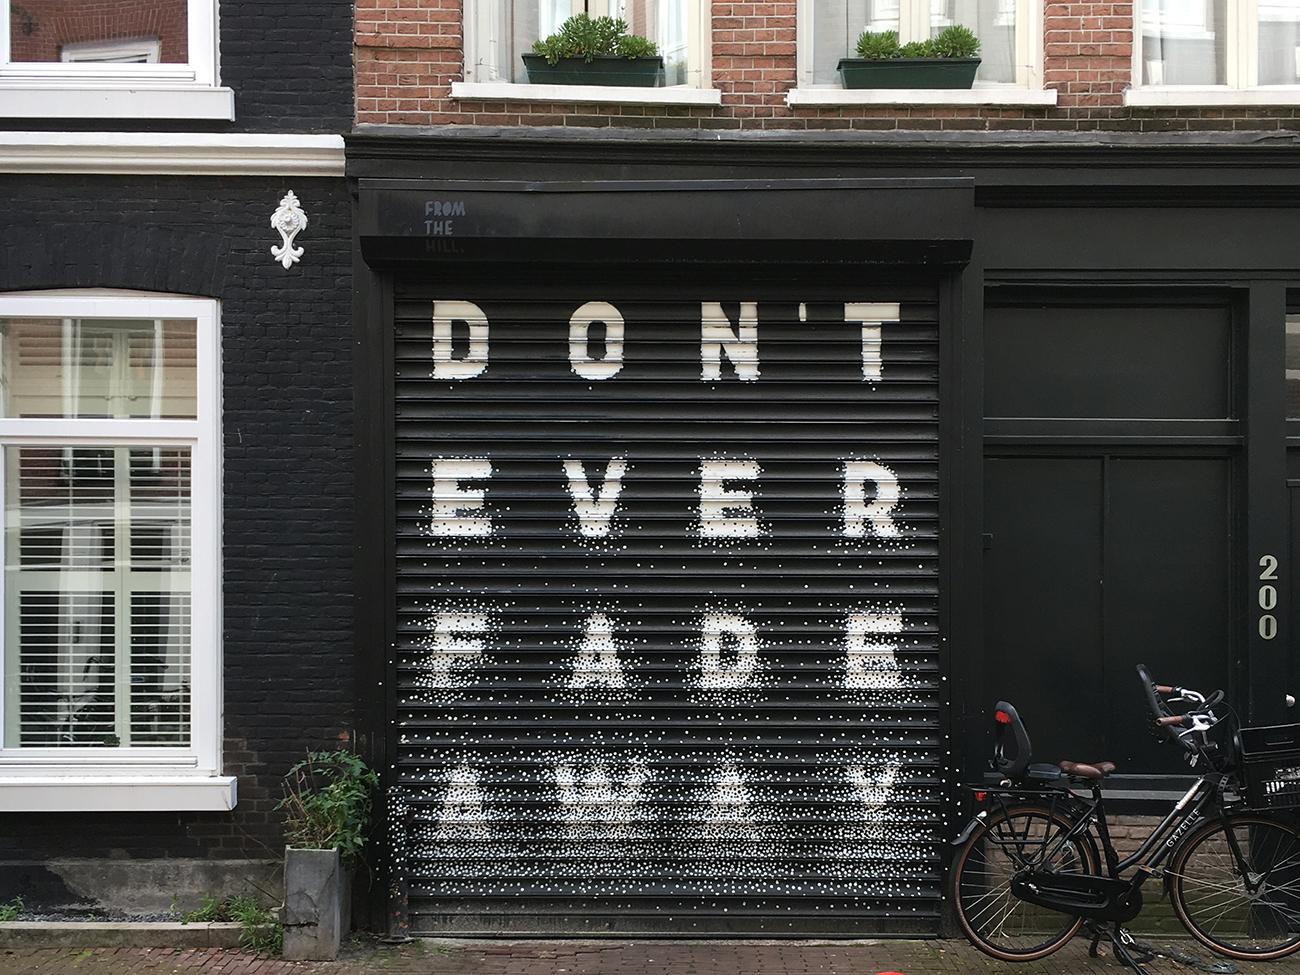 Photo taken on my Amsterdam 2017 trip